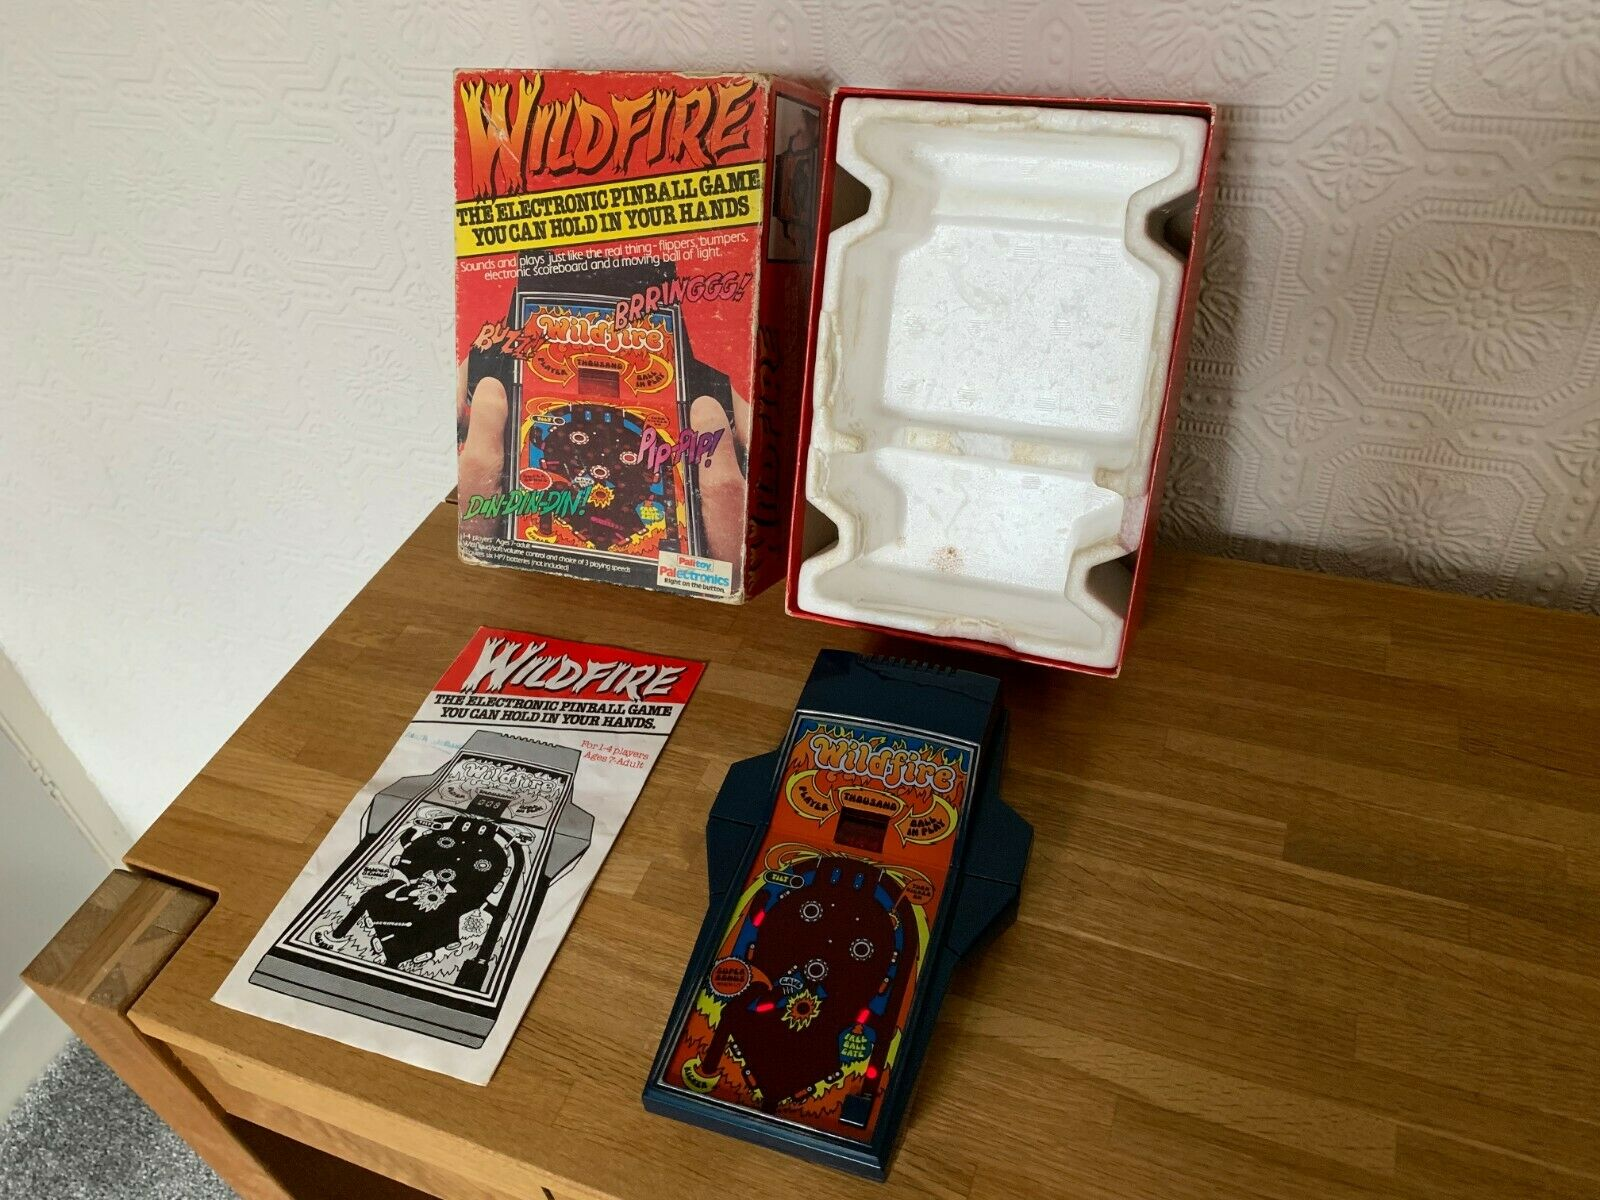 Sällsynta Palileksak Wildfire Pinboll Vintage 1979 Handhållna LED Electronic Game - Superb